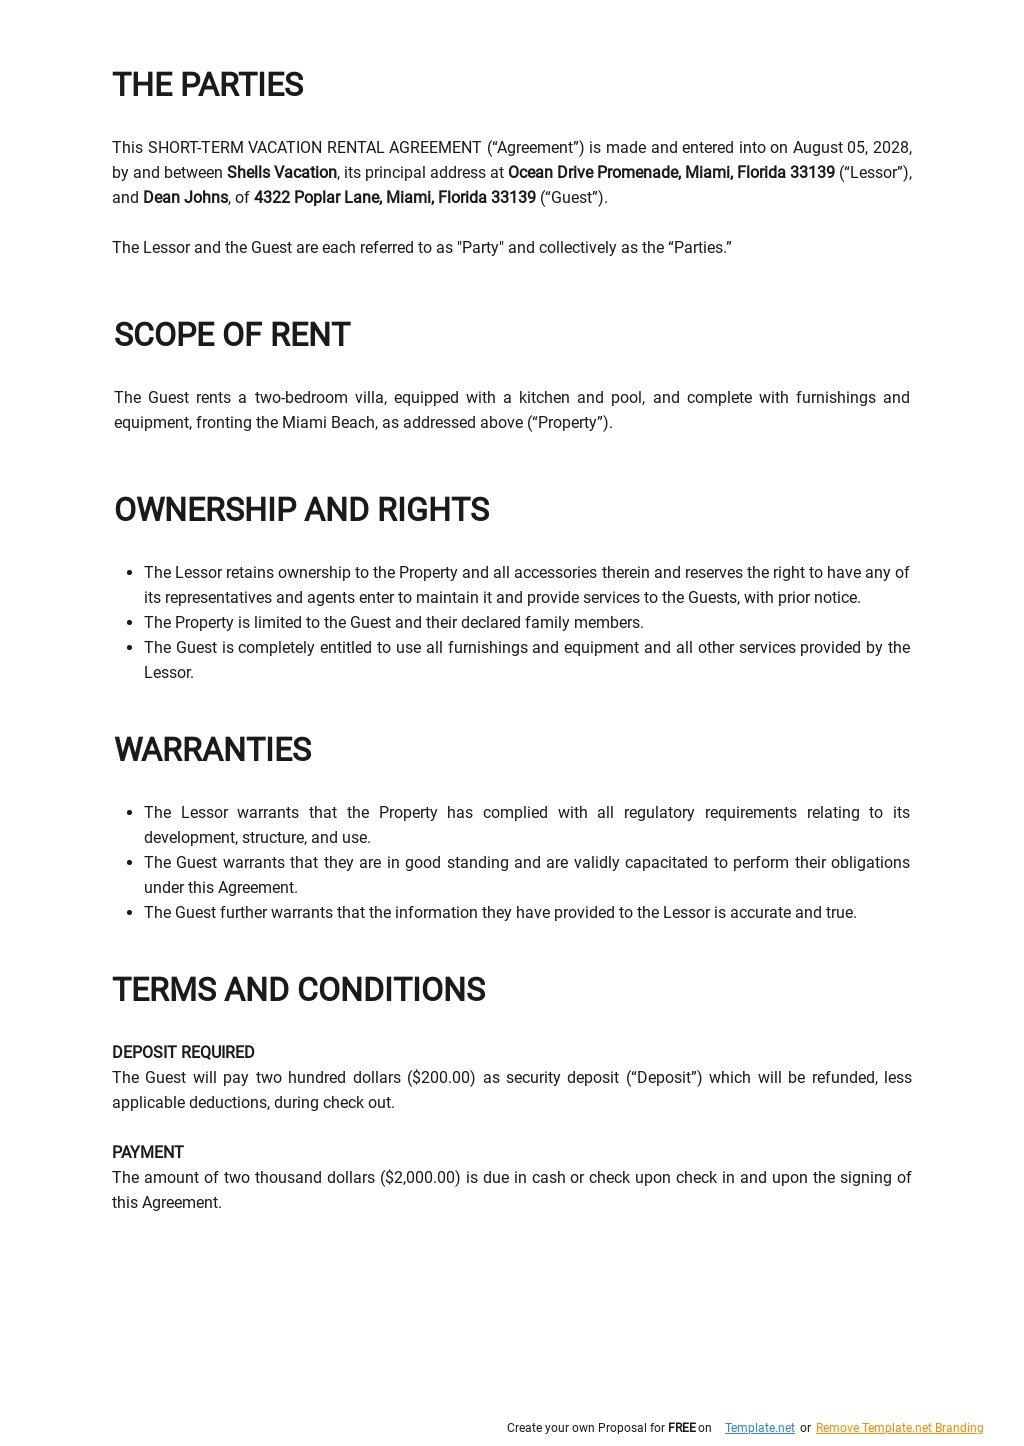 Free Short Term Vacation Rental Agreement Template 1.jpe